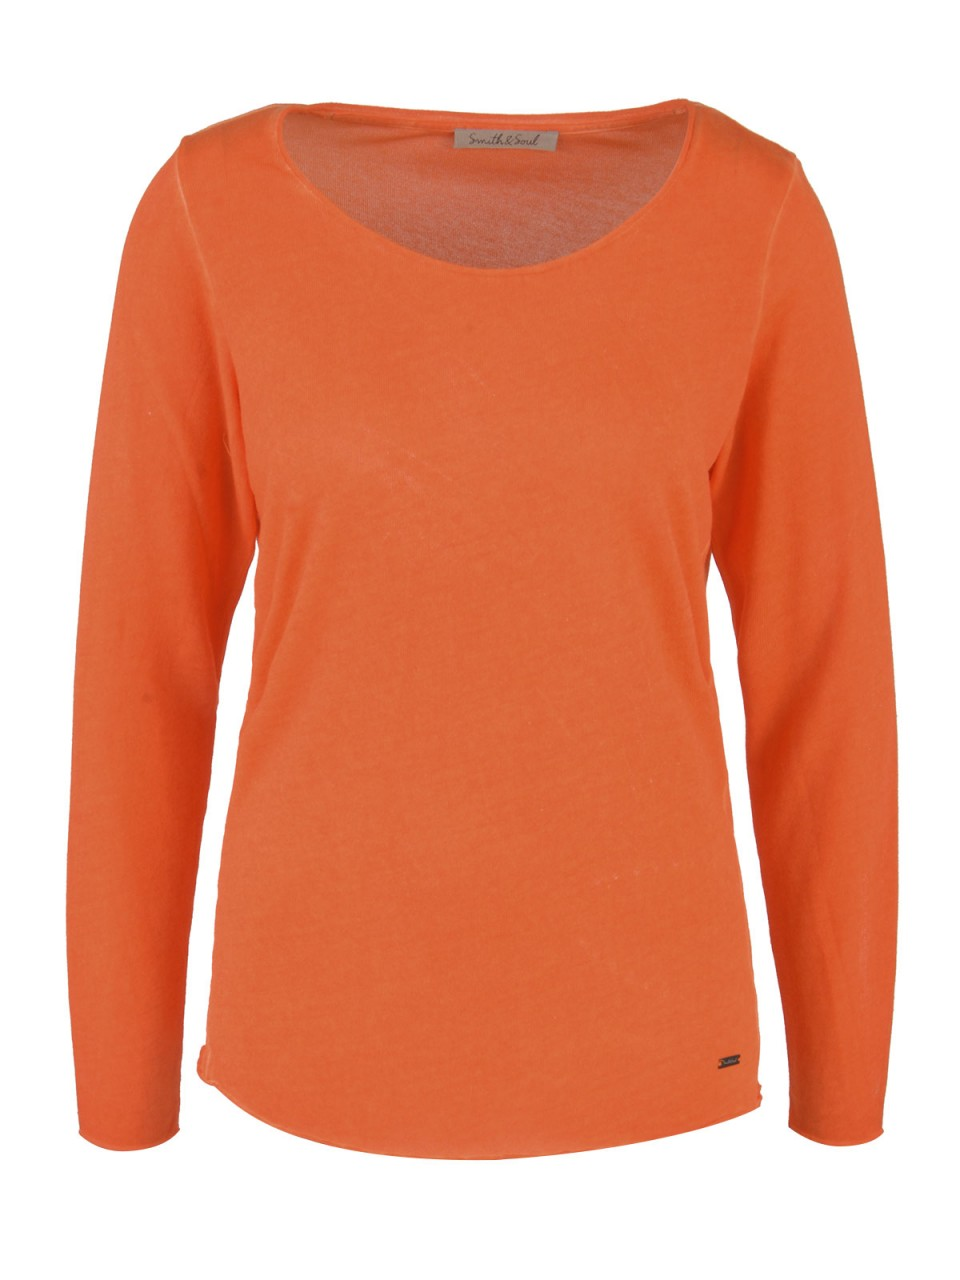 smith-amp-soul-damen-shirt-orange